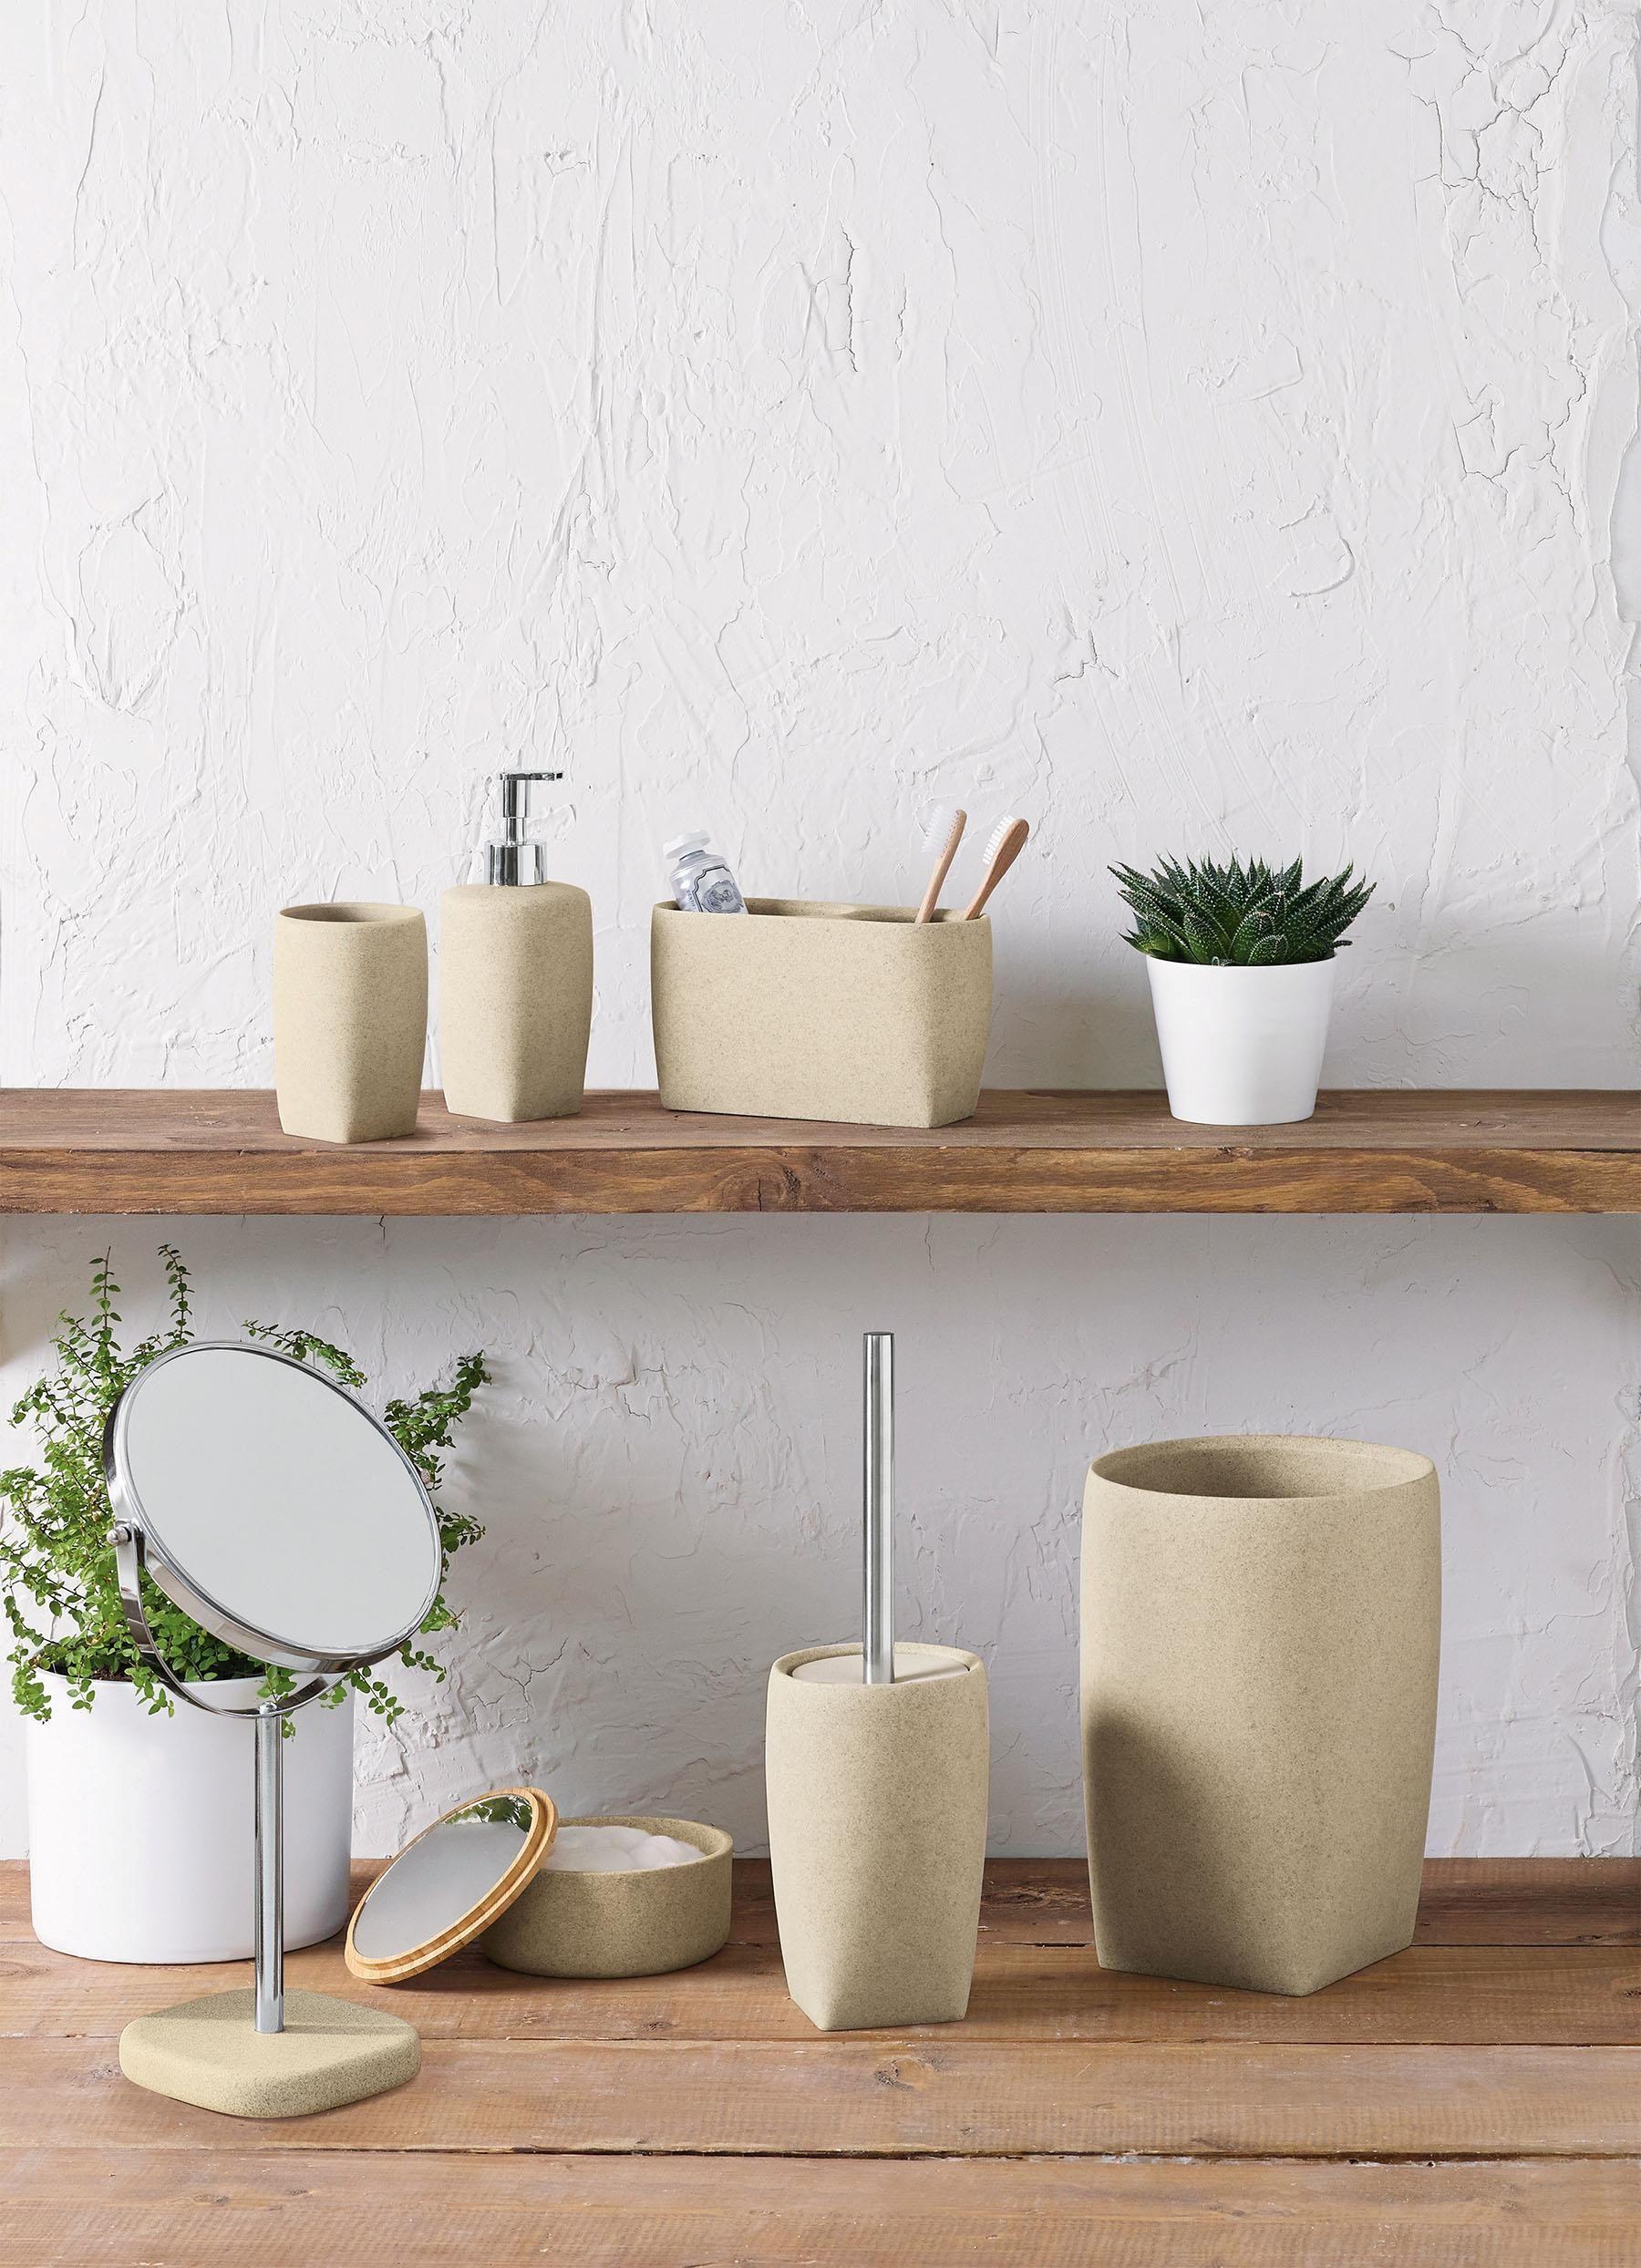 Buy Stone Resin Soap Dispenser from the Next UK online shop ...